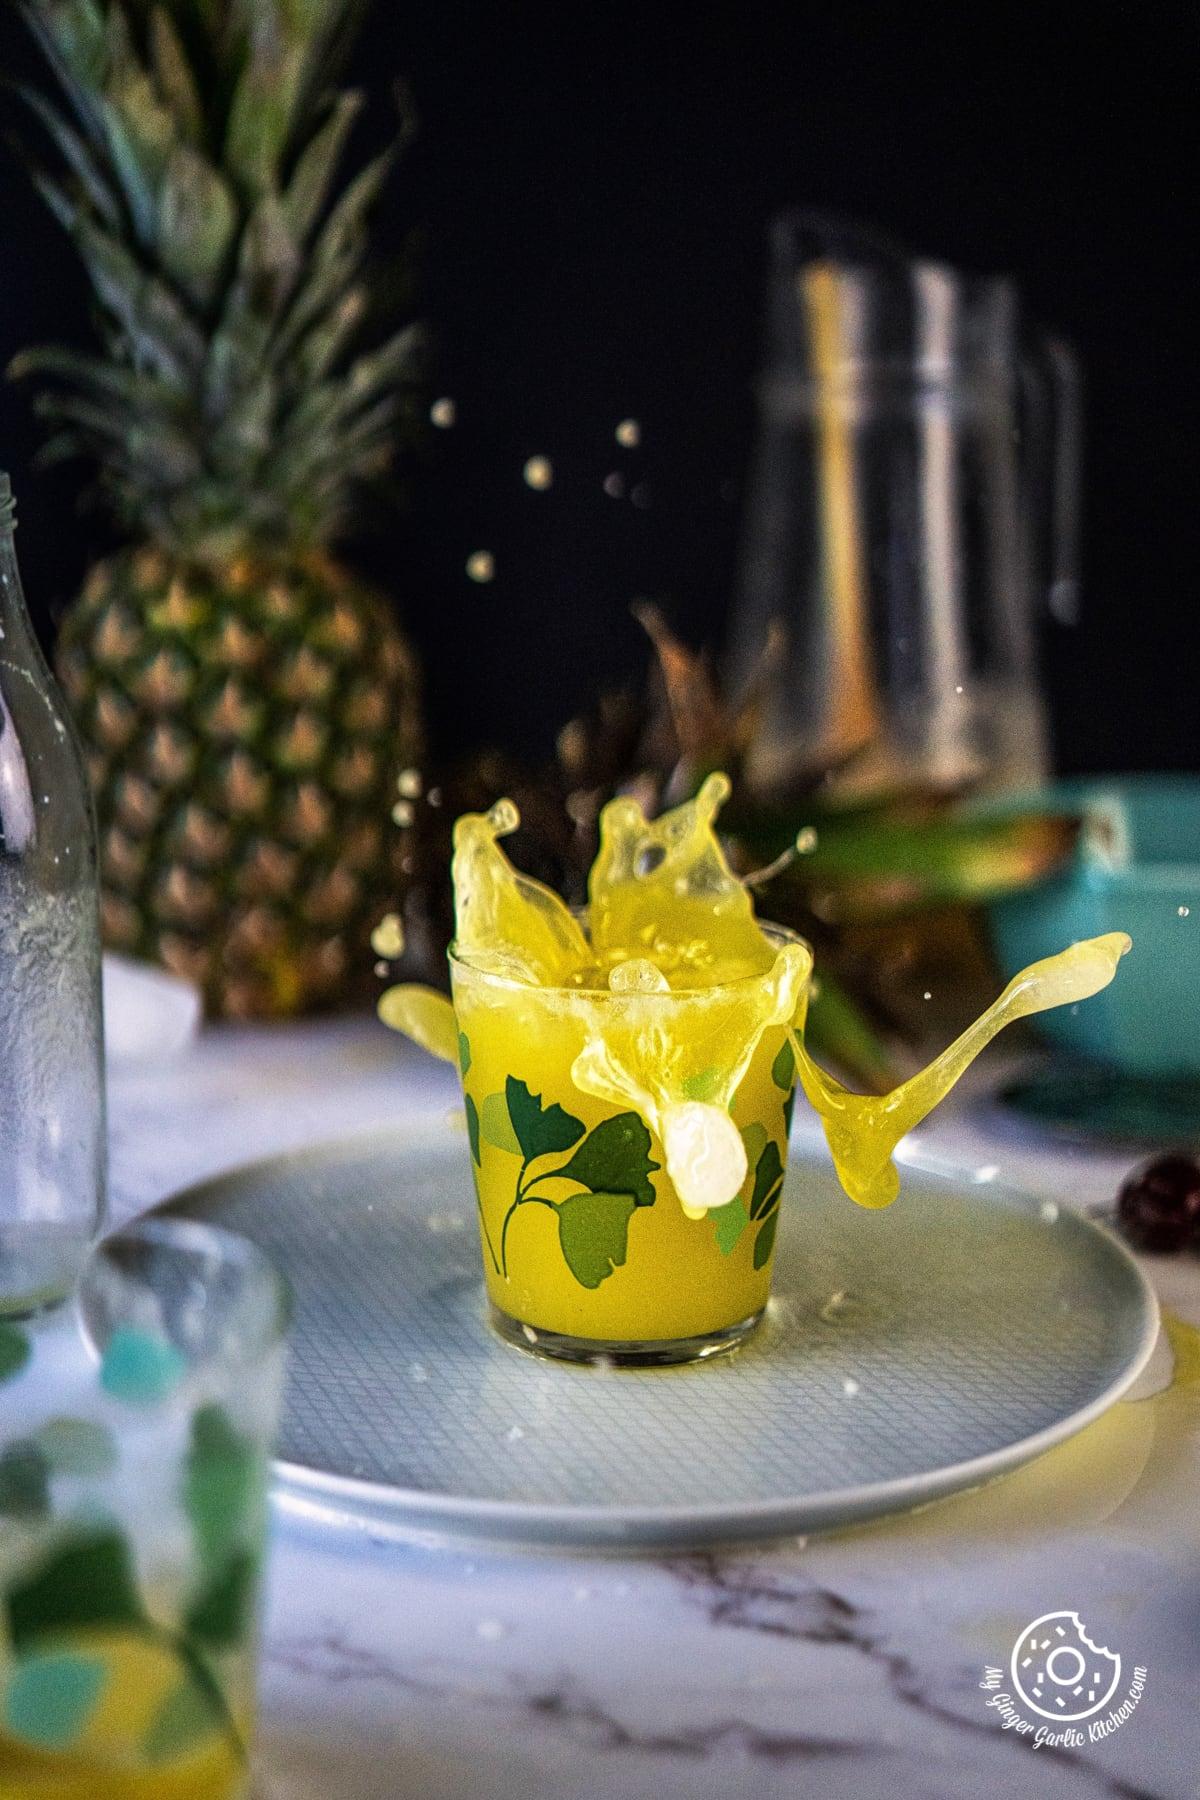 Pineapple juice splashing from a glass